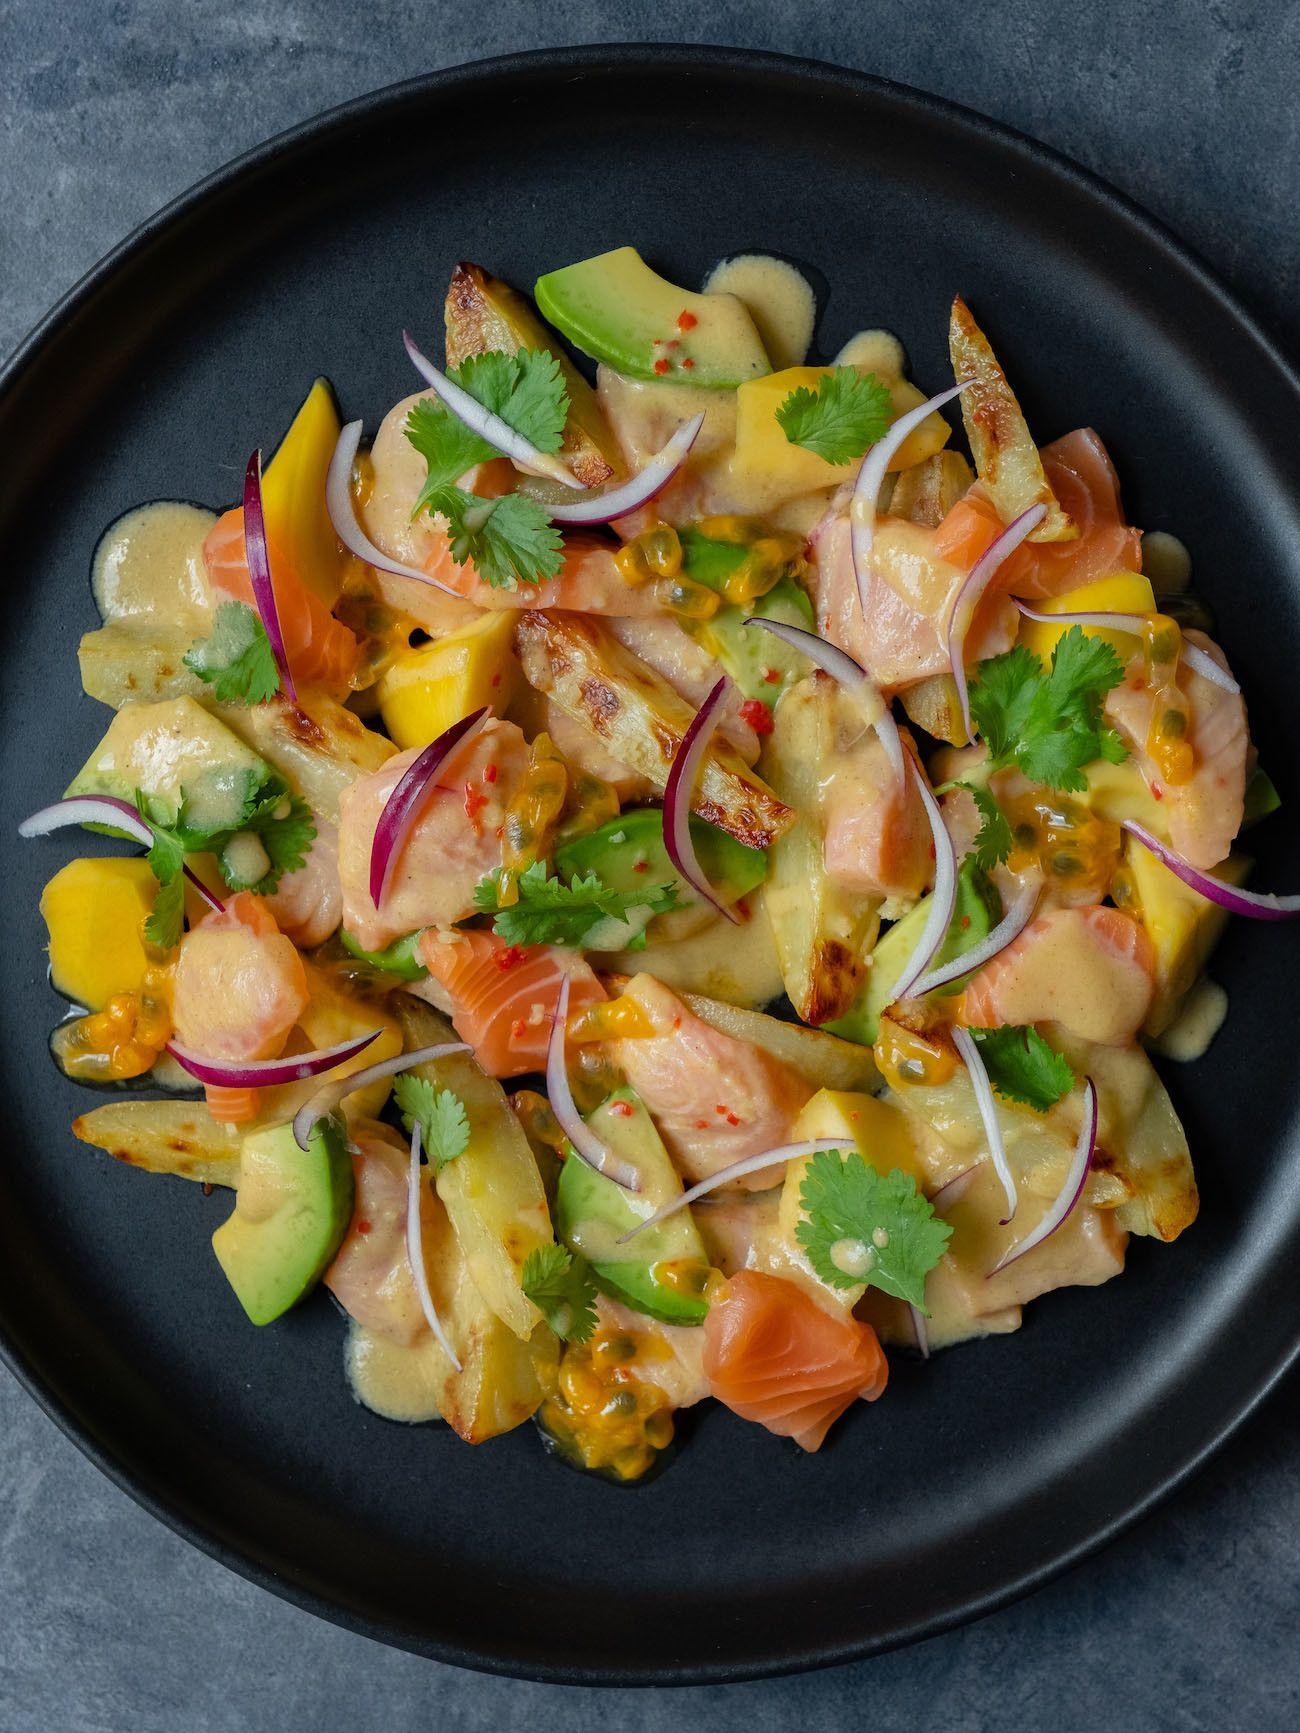 Foodblog, About Fuel, CEVICHE Das Kochbuch, Juan Danilo, rote Zwiebeln, Mango, Maracuja, Koriander